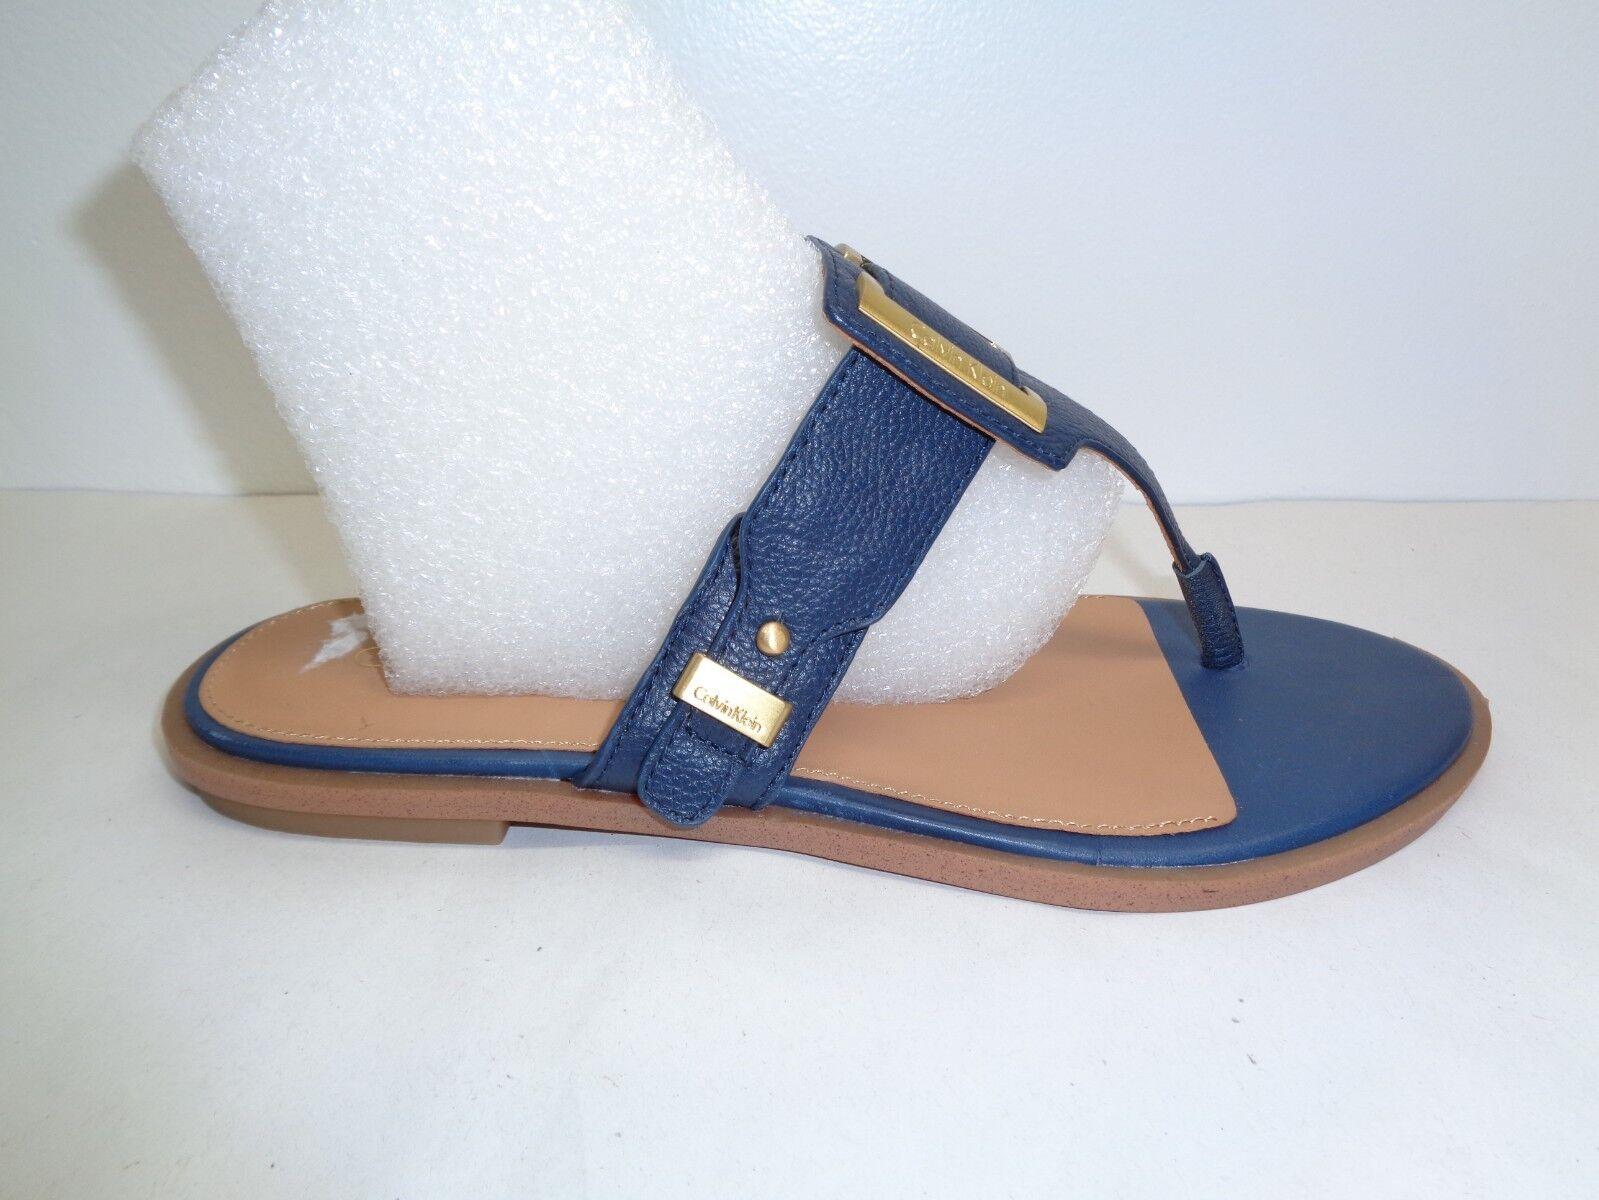 Calvin Klein Größe 6.5 M ULA Navy Blau Leder Toe Ring Sandales NEU Damenschuhe Schuhes